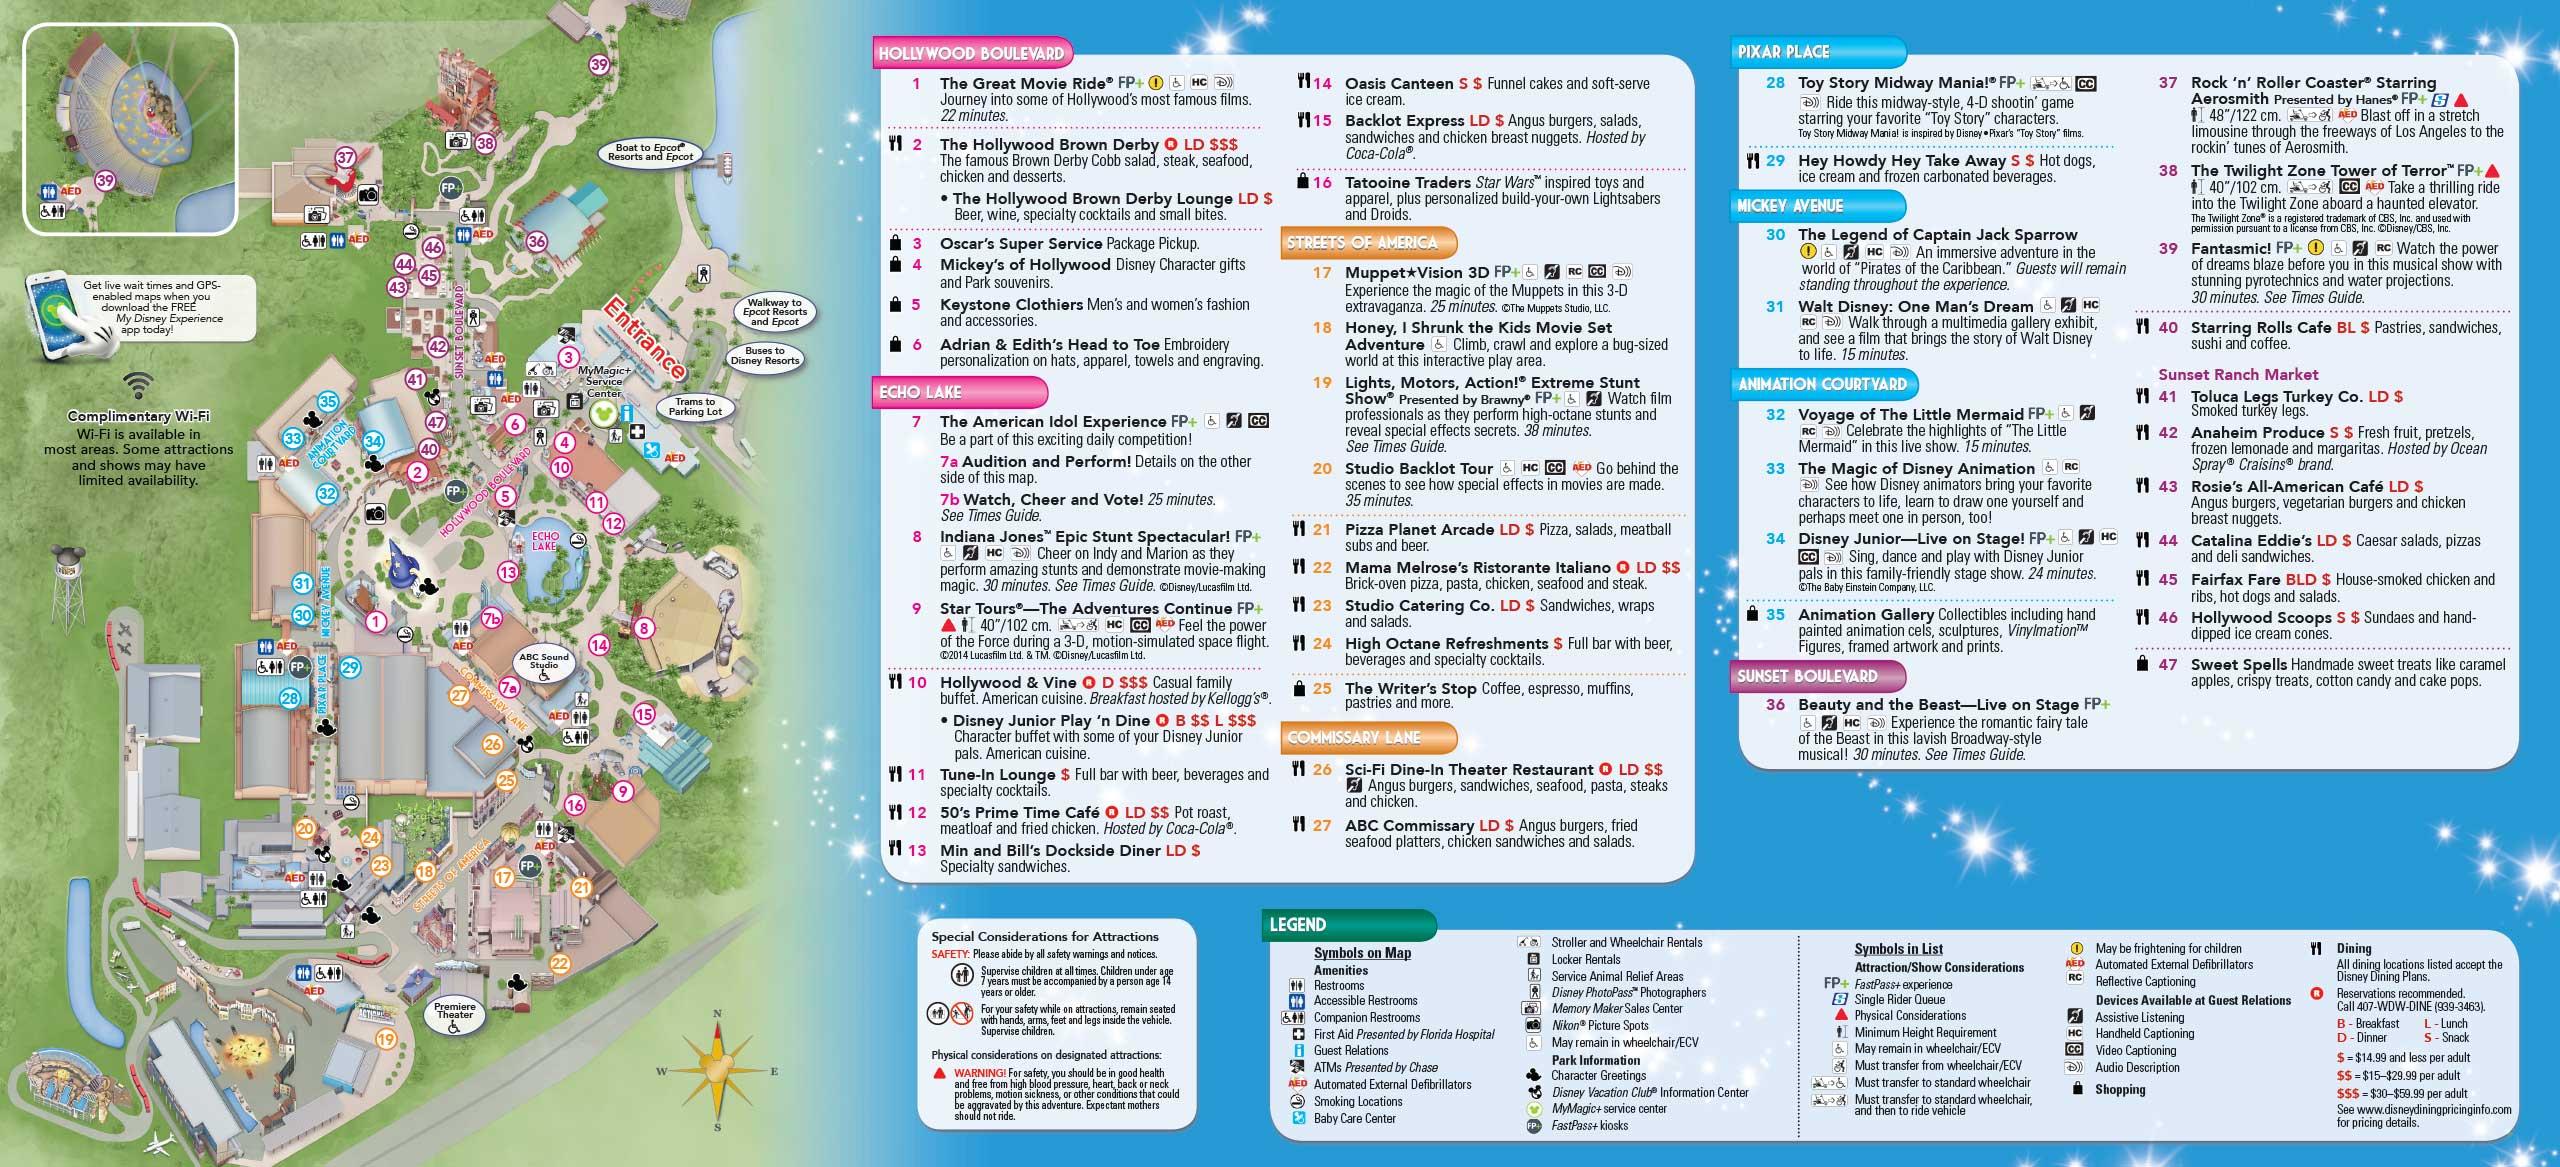 2014 Walt Disney World Park Maps with FastPass+ - Photo 8 of 8